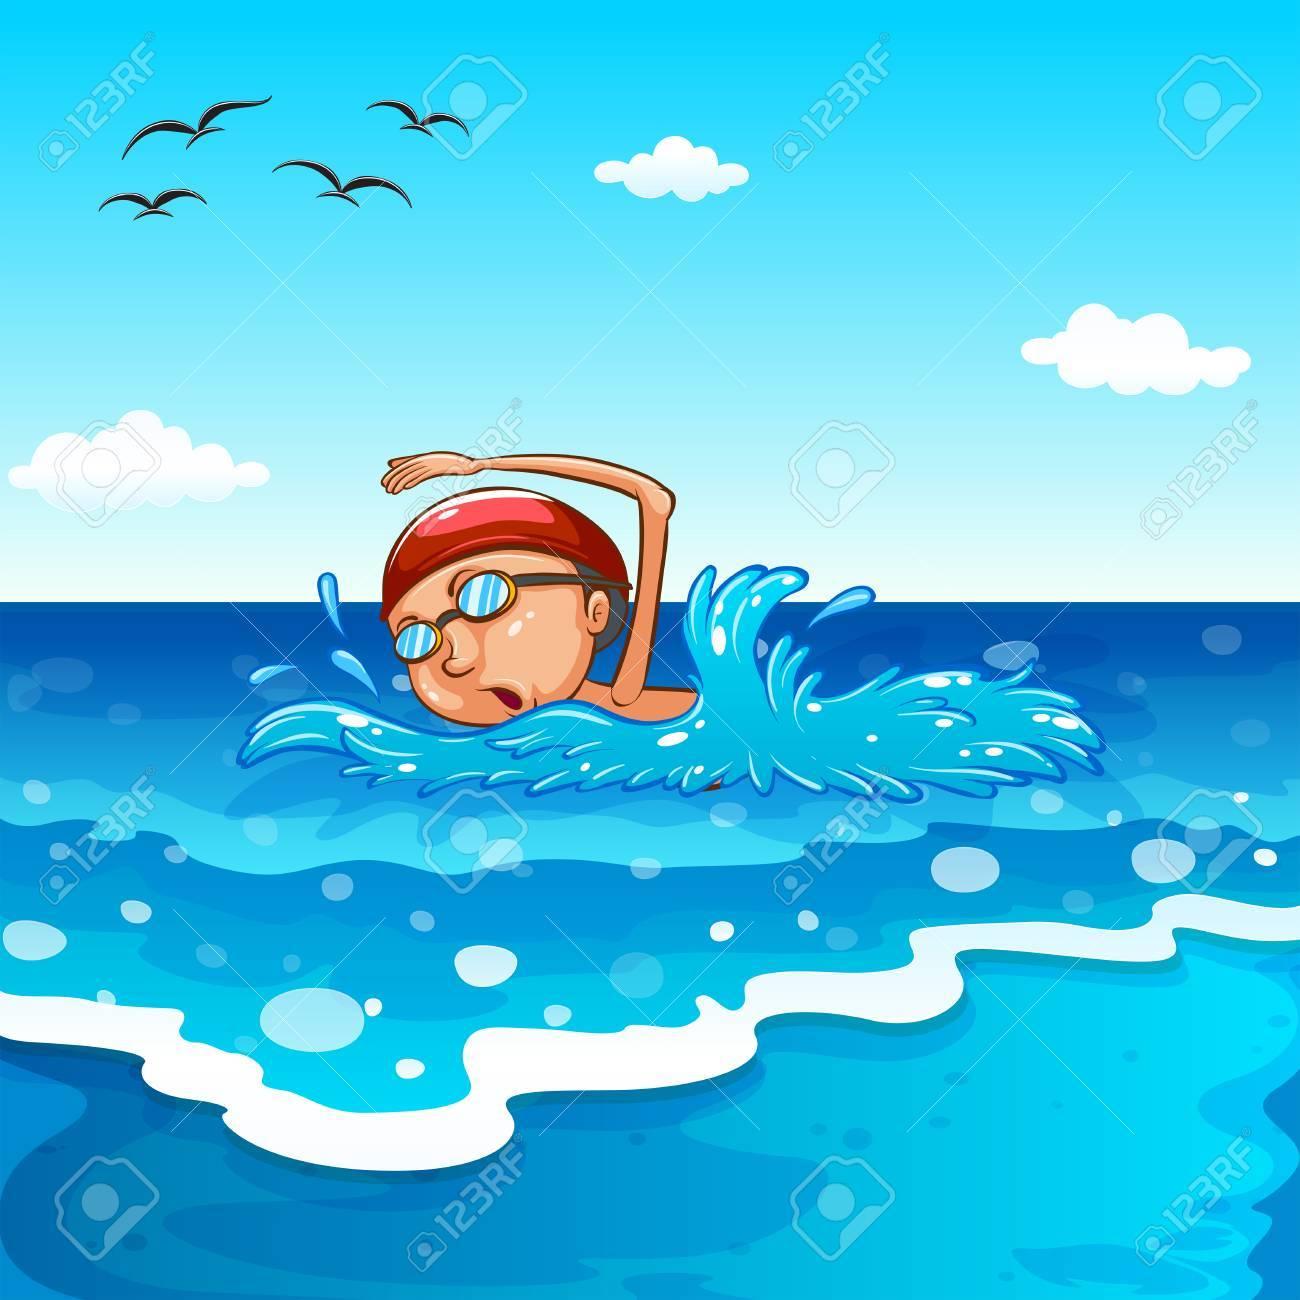 Clipart swimming sea, Clipart swimming sea Transparent FREE.